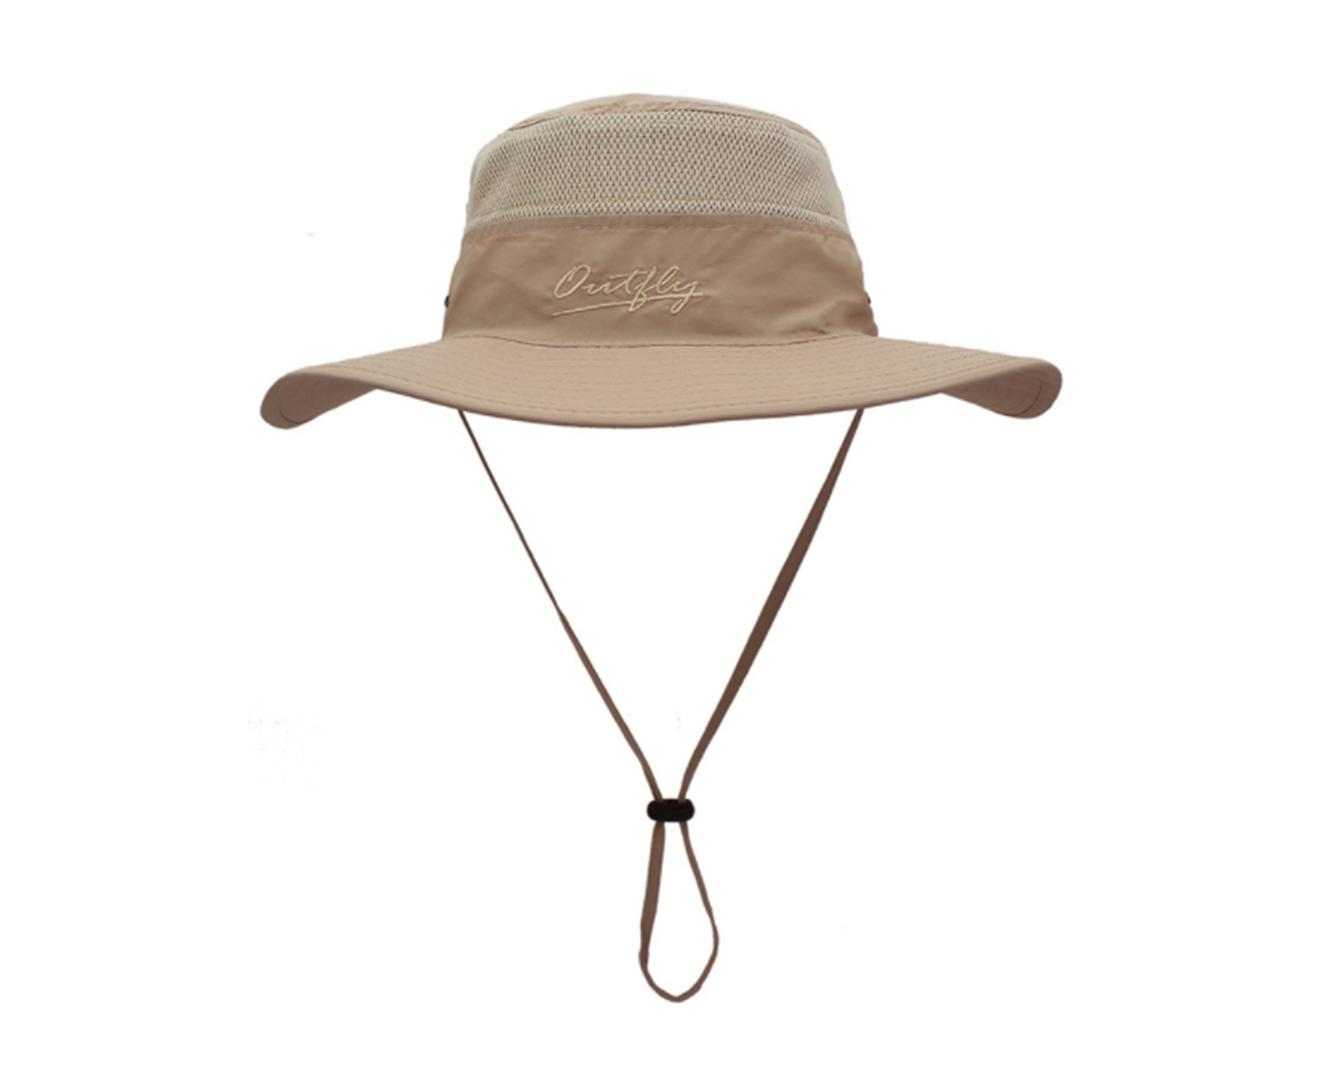 Unisex Wide Brim Sun Hat,Outdoor UPF 50+ Waterproof Boonie Hat Summer UV Protection Sun Caps-KHAKI